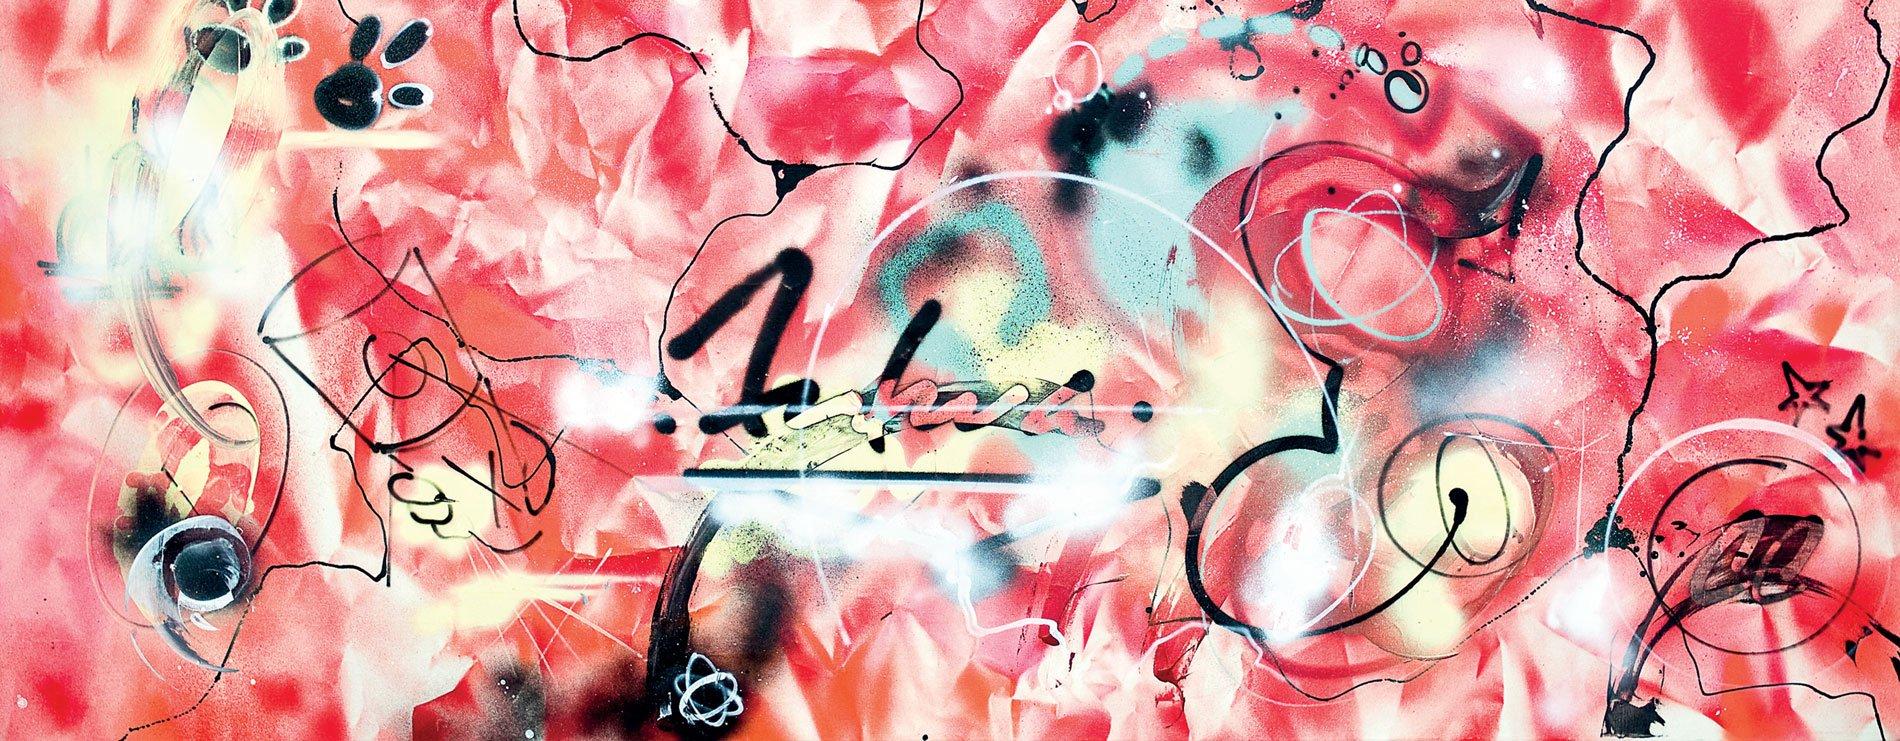 Full Frame Futura 2000 by Magda Danisz